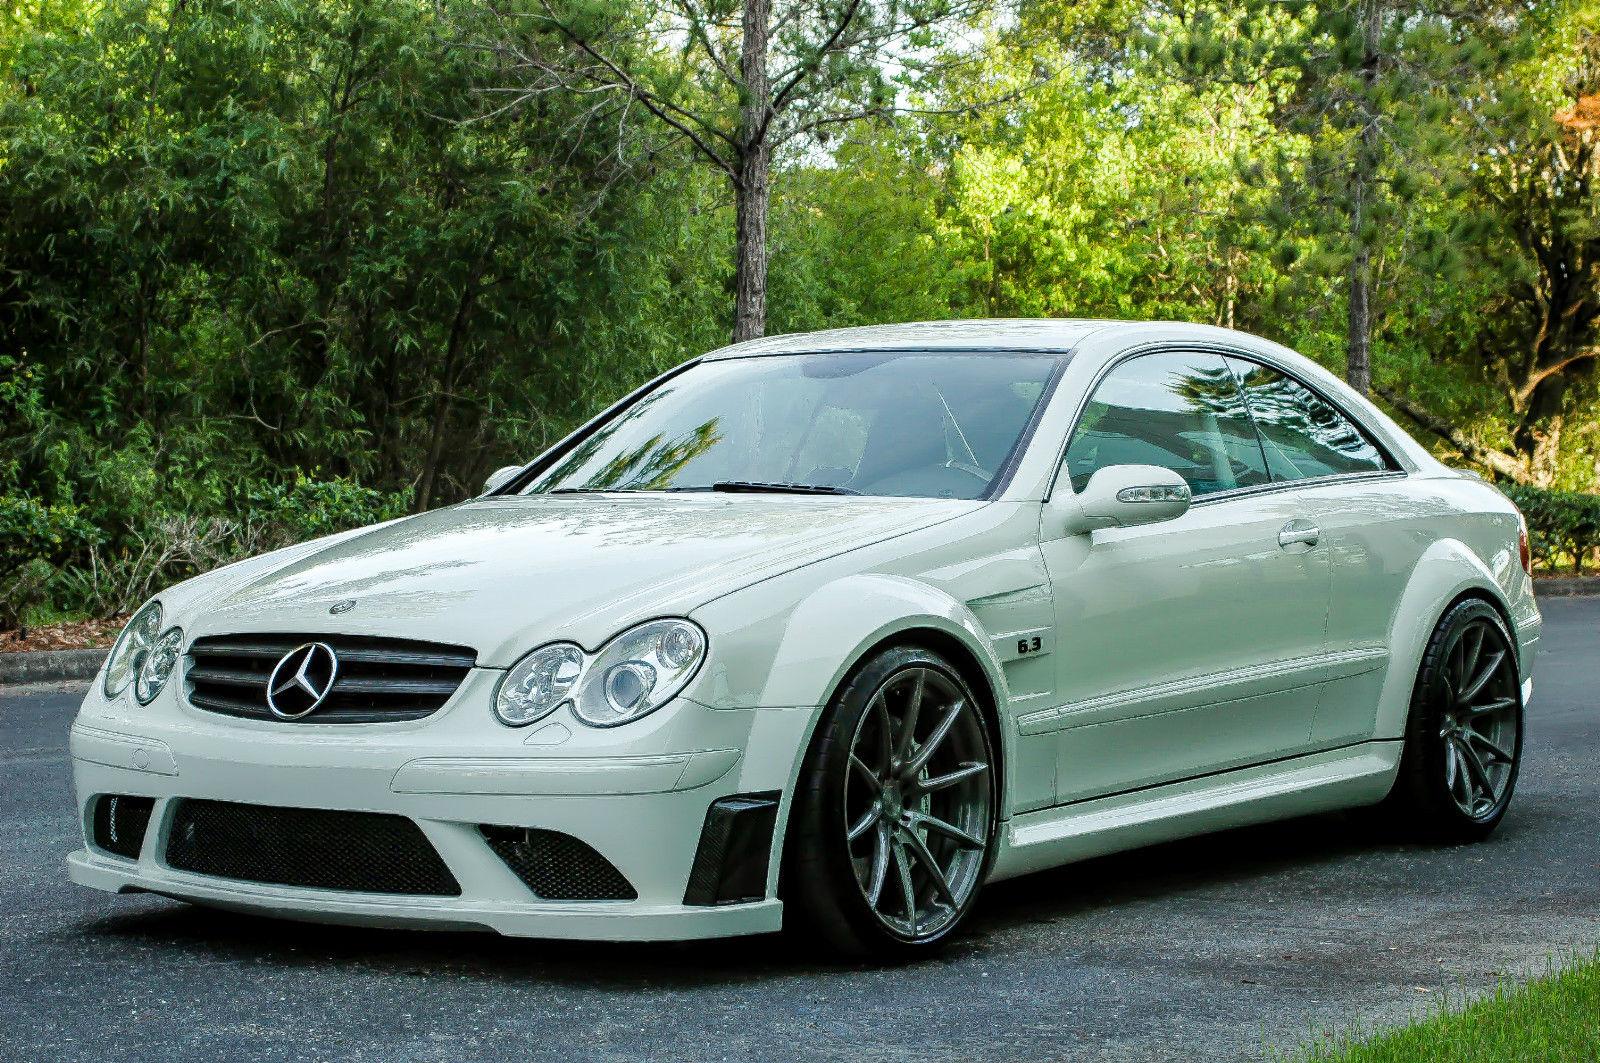 Mercedes benz clk 63 amg black series for Mercedes benz clk63 amg black series